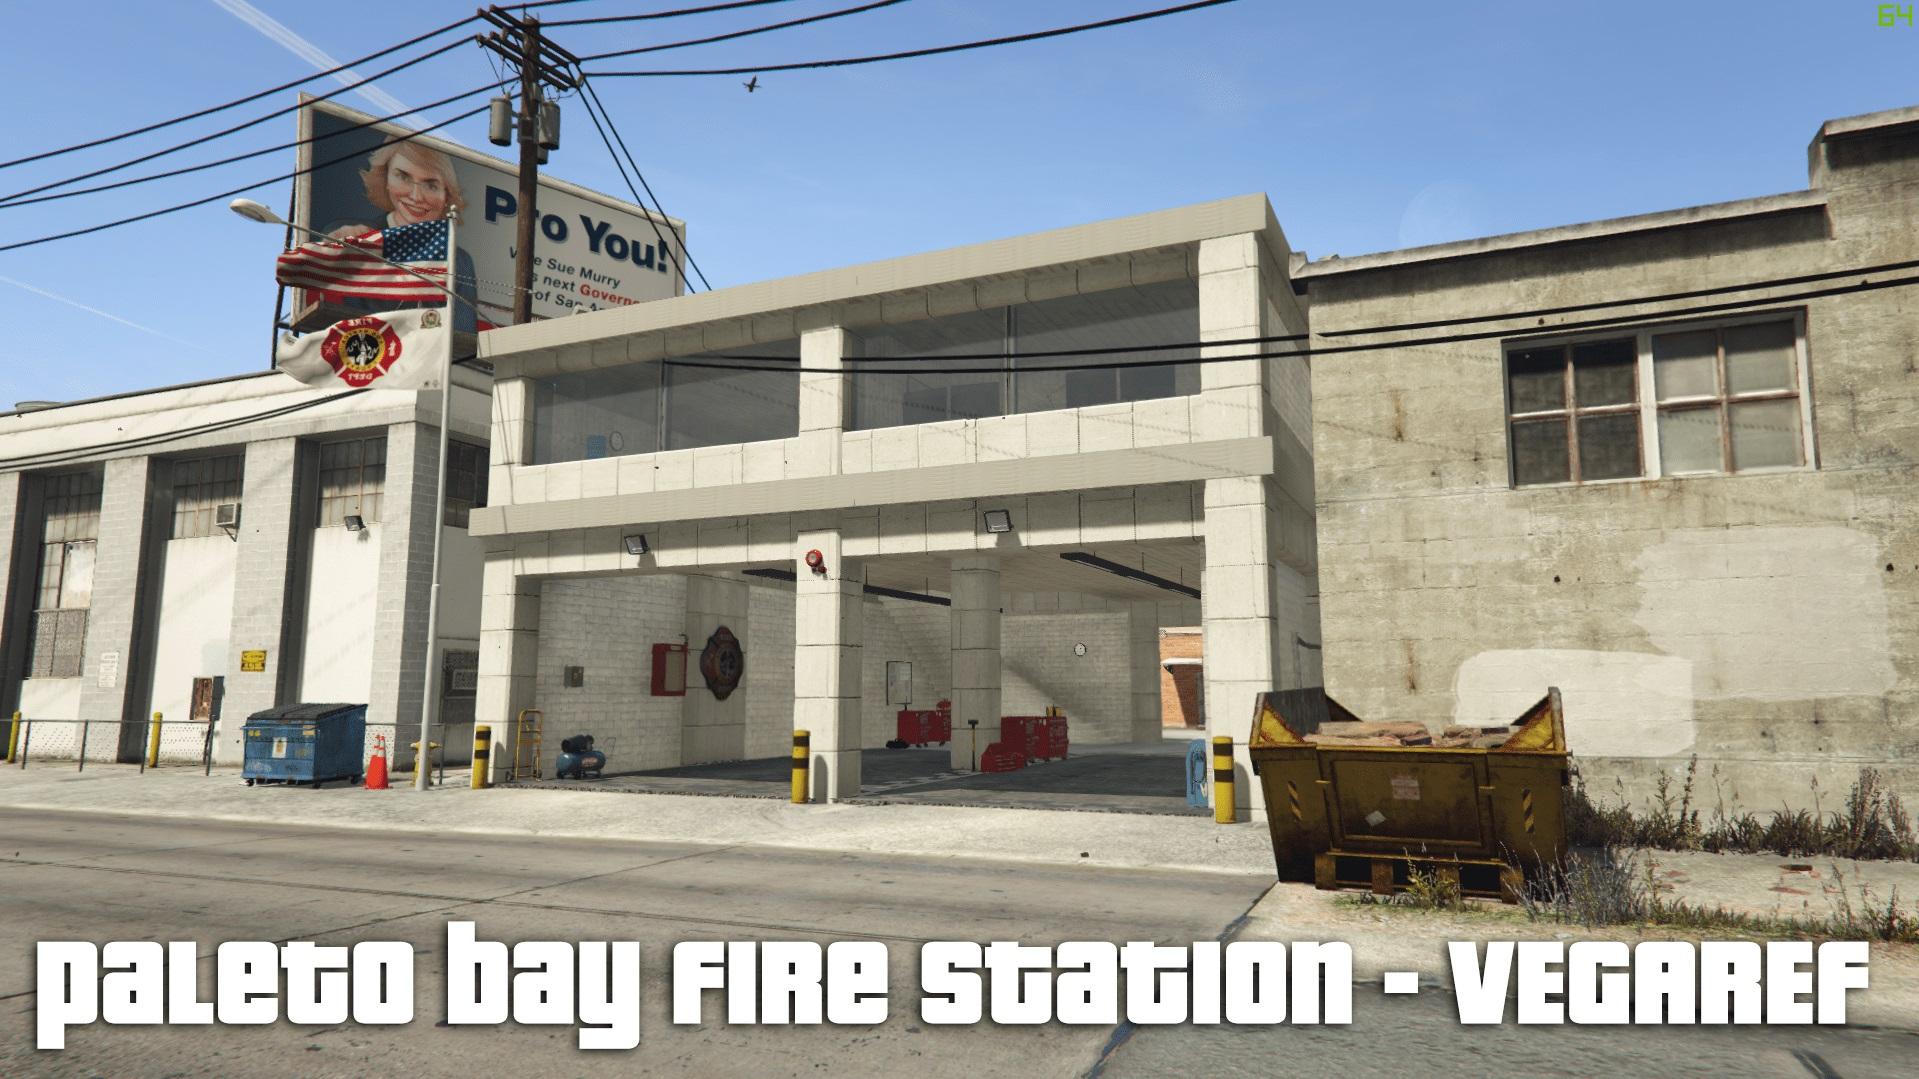 Paleto bay - fire station - fire house - Menyoo xml file 0.1